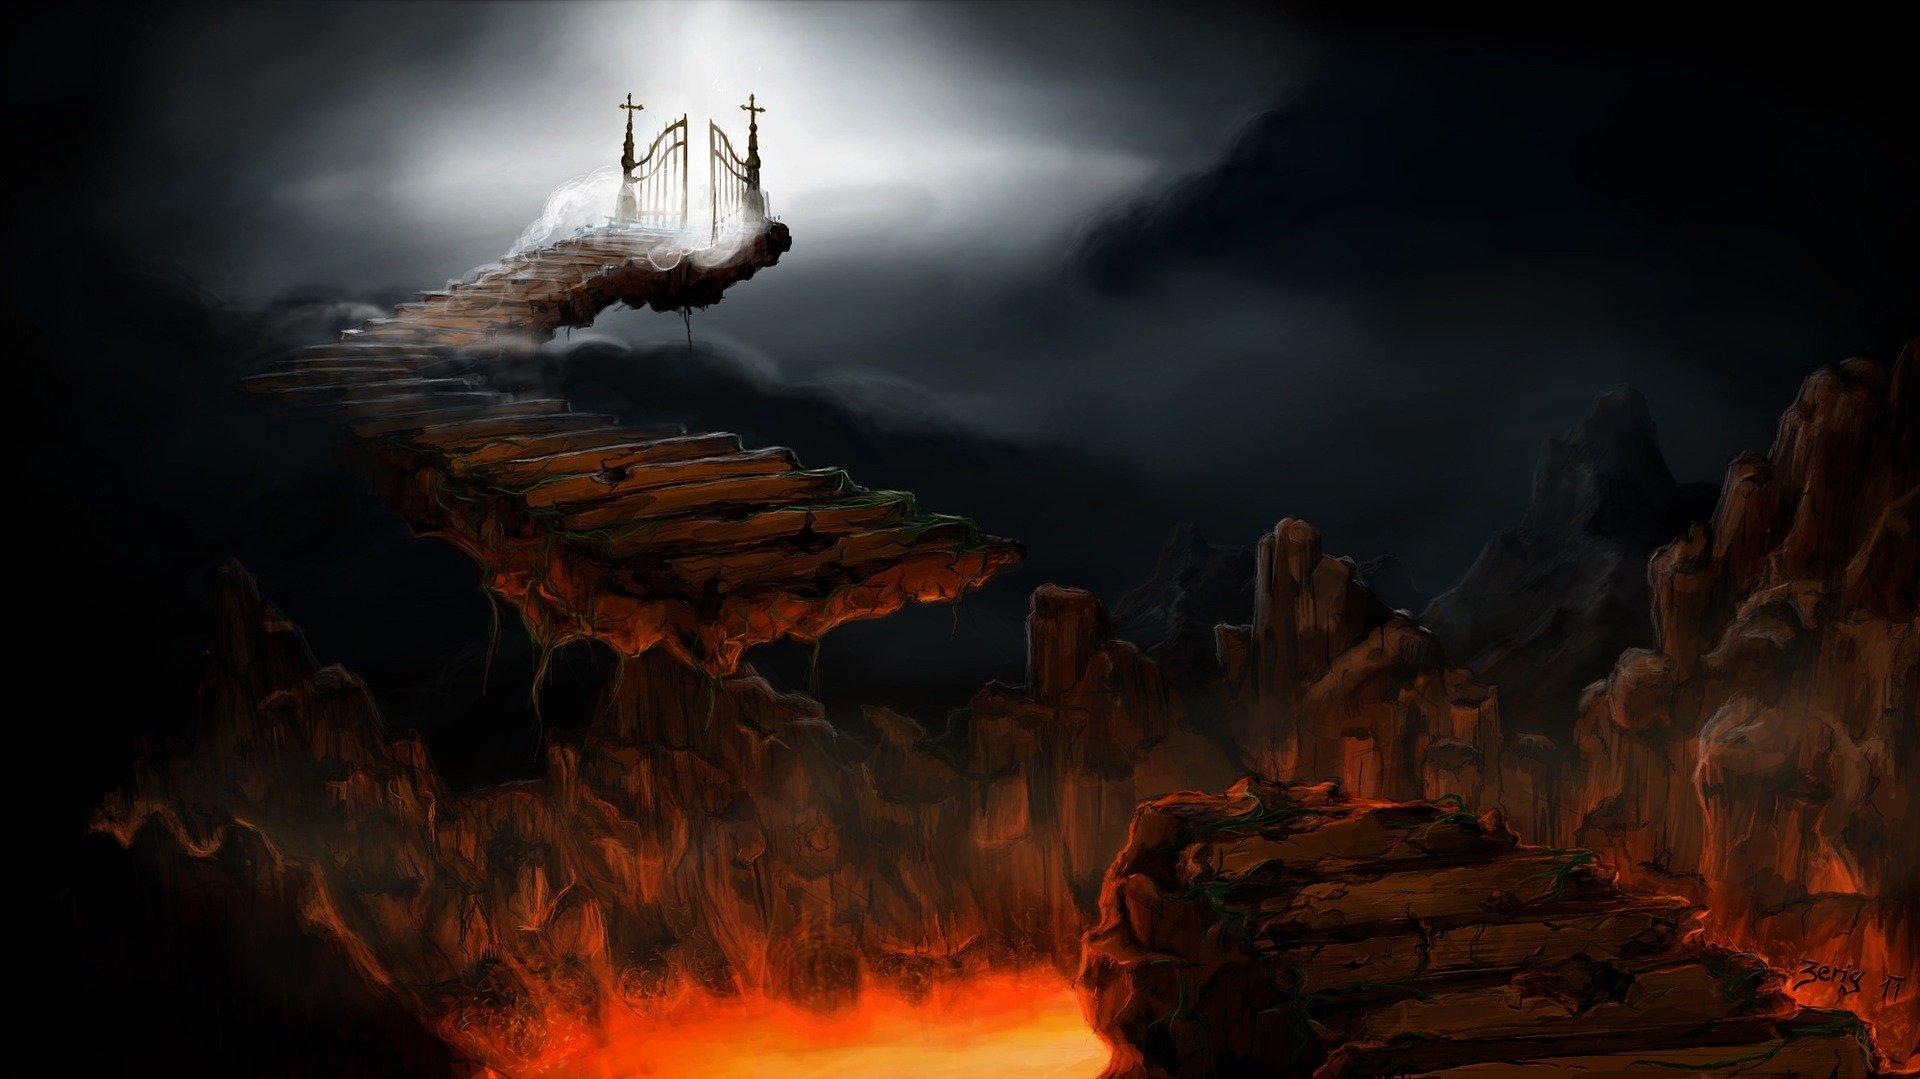 Cielo e infierno. Fuente: Pixabay